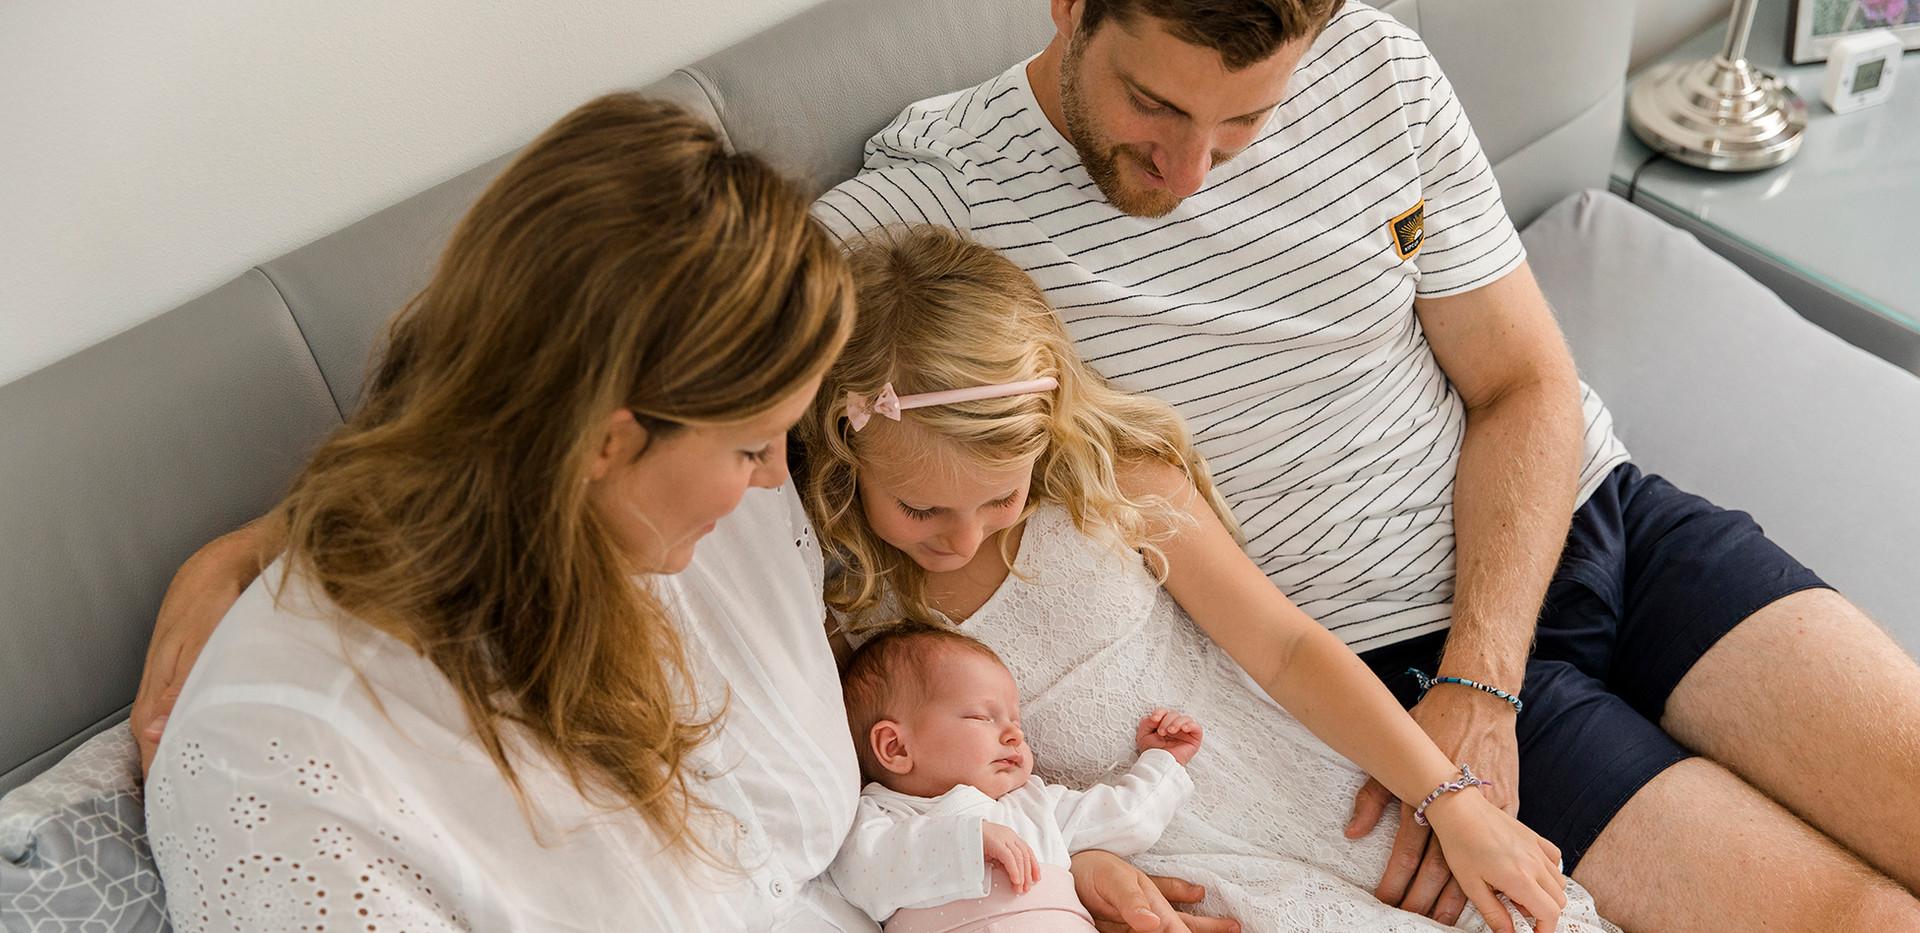 Homestory, Baby Homestory, Lifestyle Fotografie, Familenfoto, Familienshooting zu Hause, Familienfotos, Familienfotos Wien, Familienfotos Korneuburg, Familienfotos Tulln